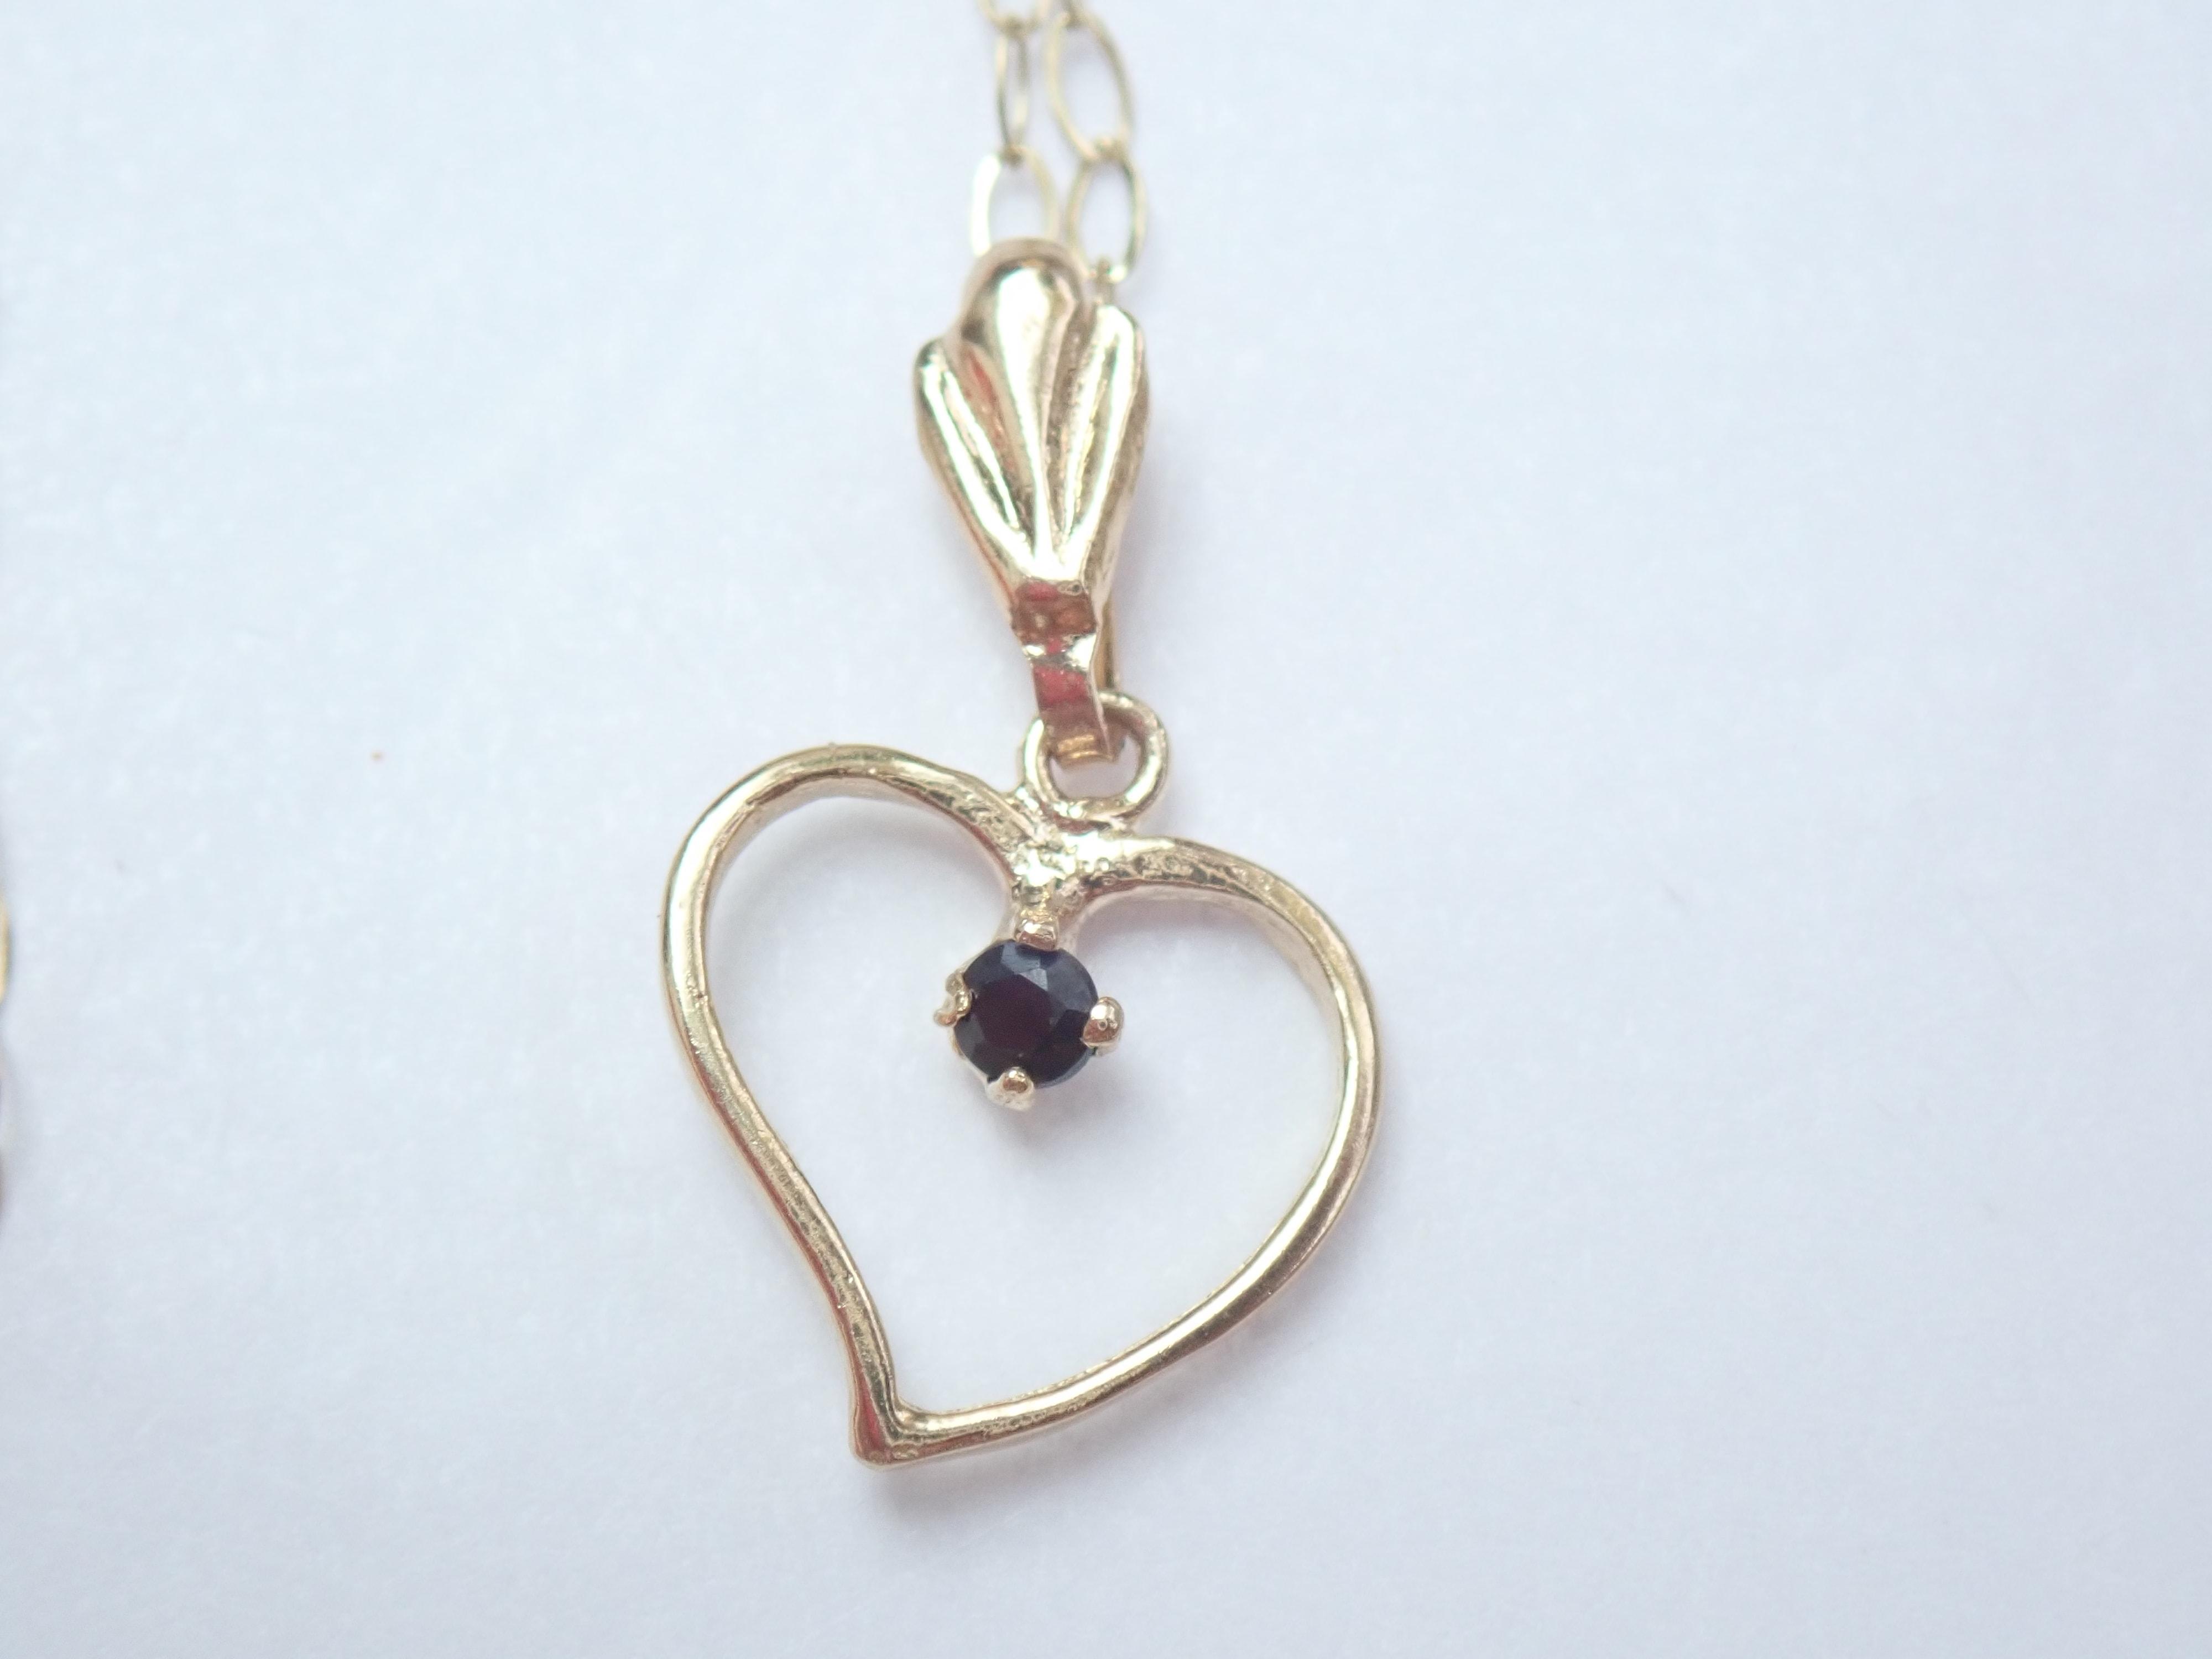 Beautiful!! Girls 375 Gold Heart Pendant Natural Blue Sapphire 13″ chain -0.6gms #10